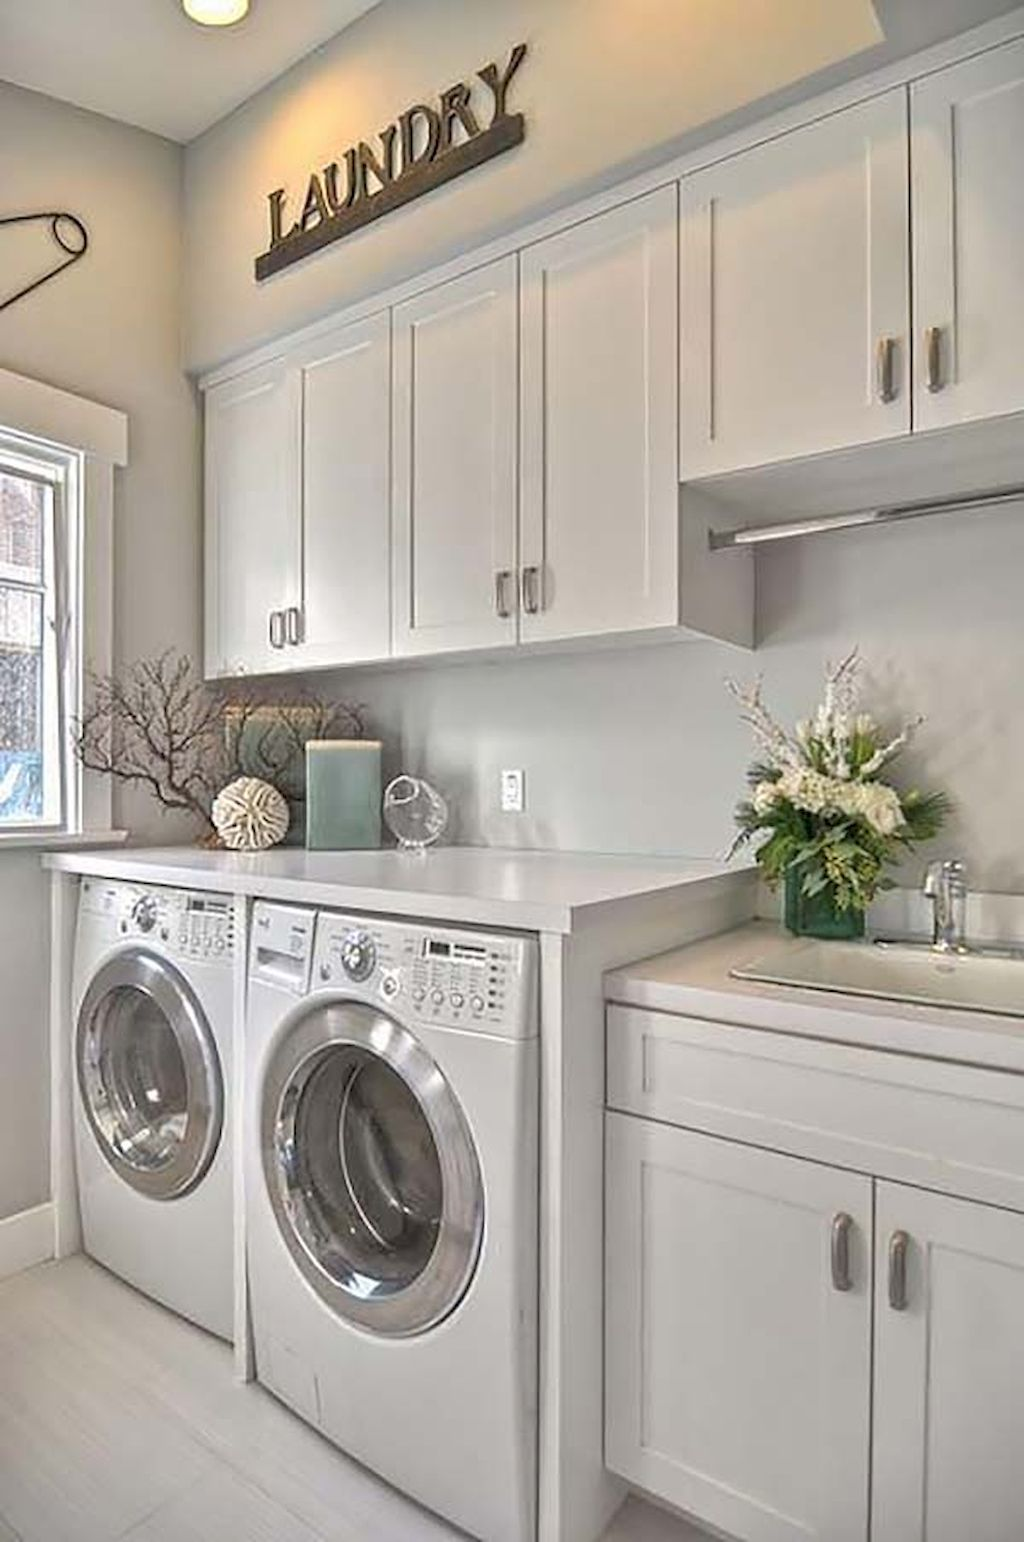 Small Laundry Room Storage And Organization Ideas 68